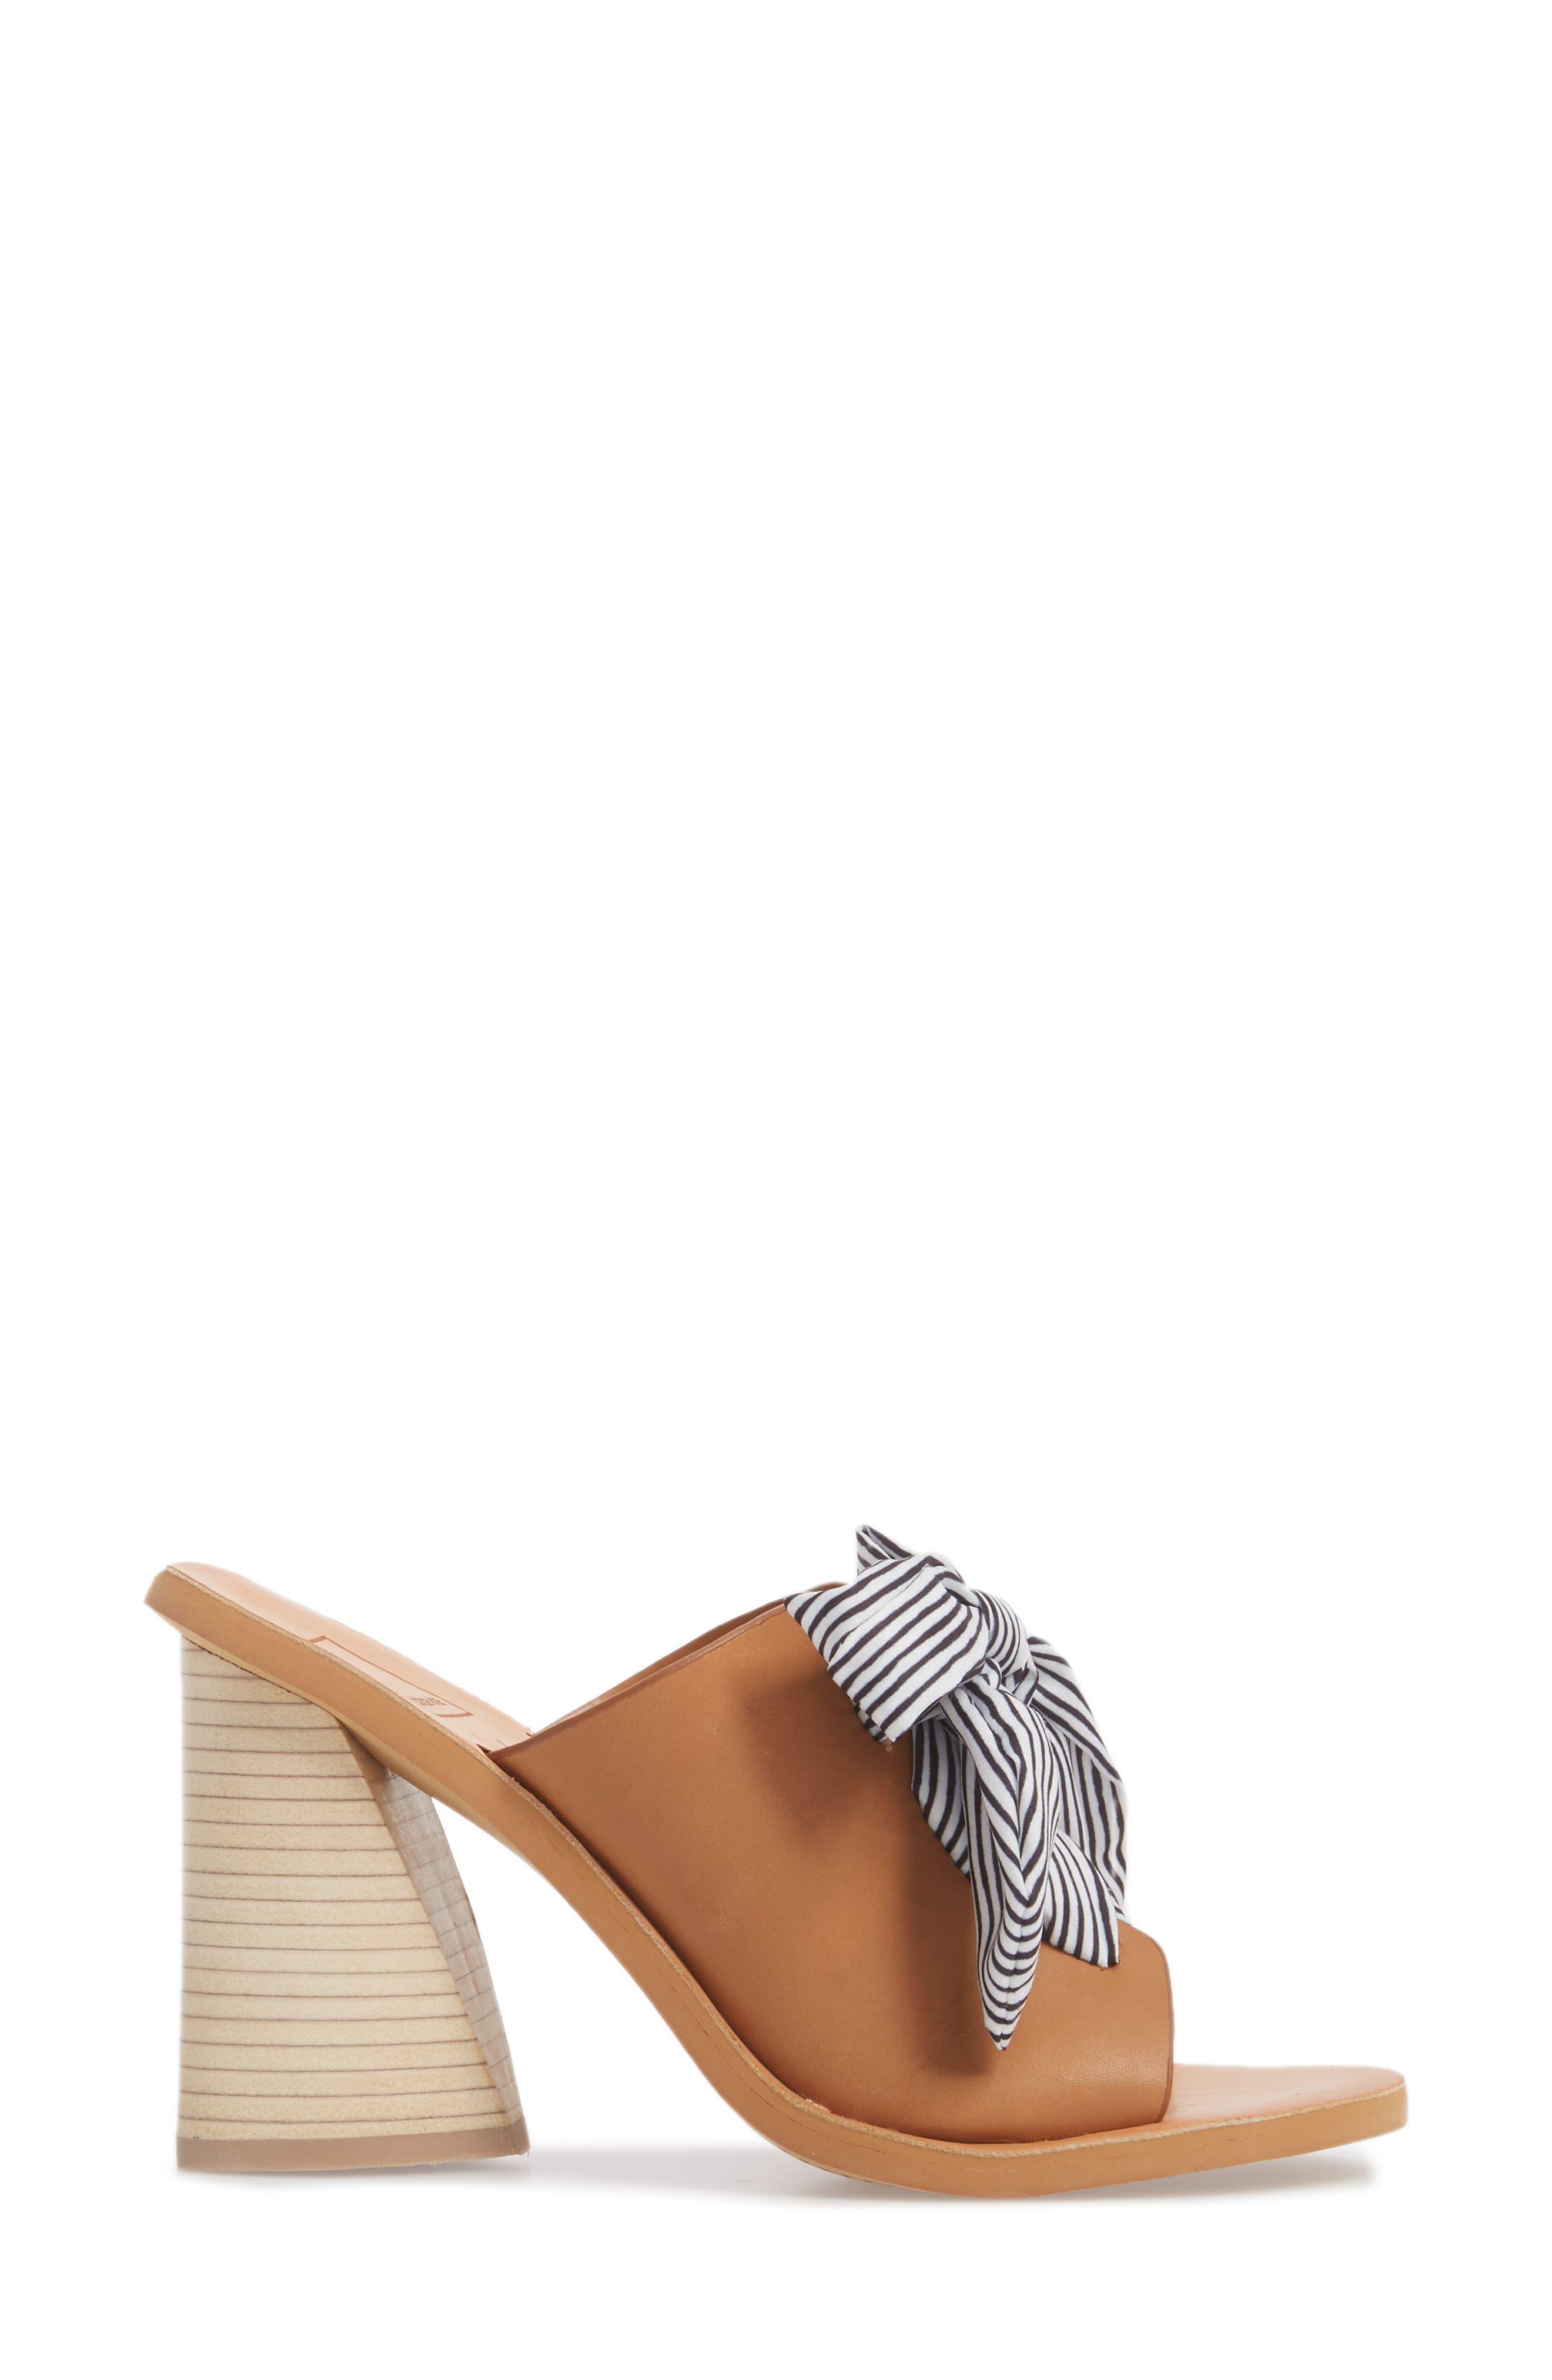 Amber Lace-Up Sandal,                             Alternate thumbnail 3, color,                             Caramel Leather